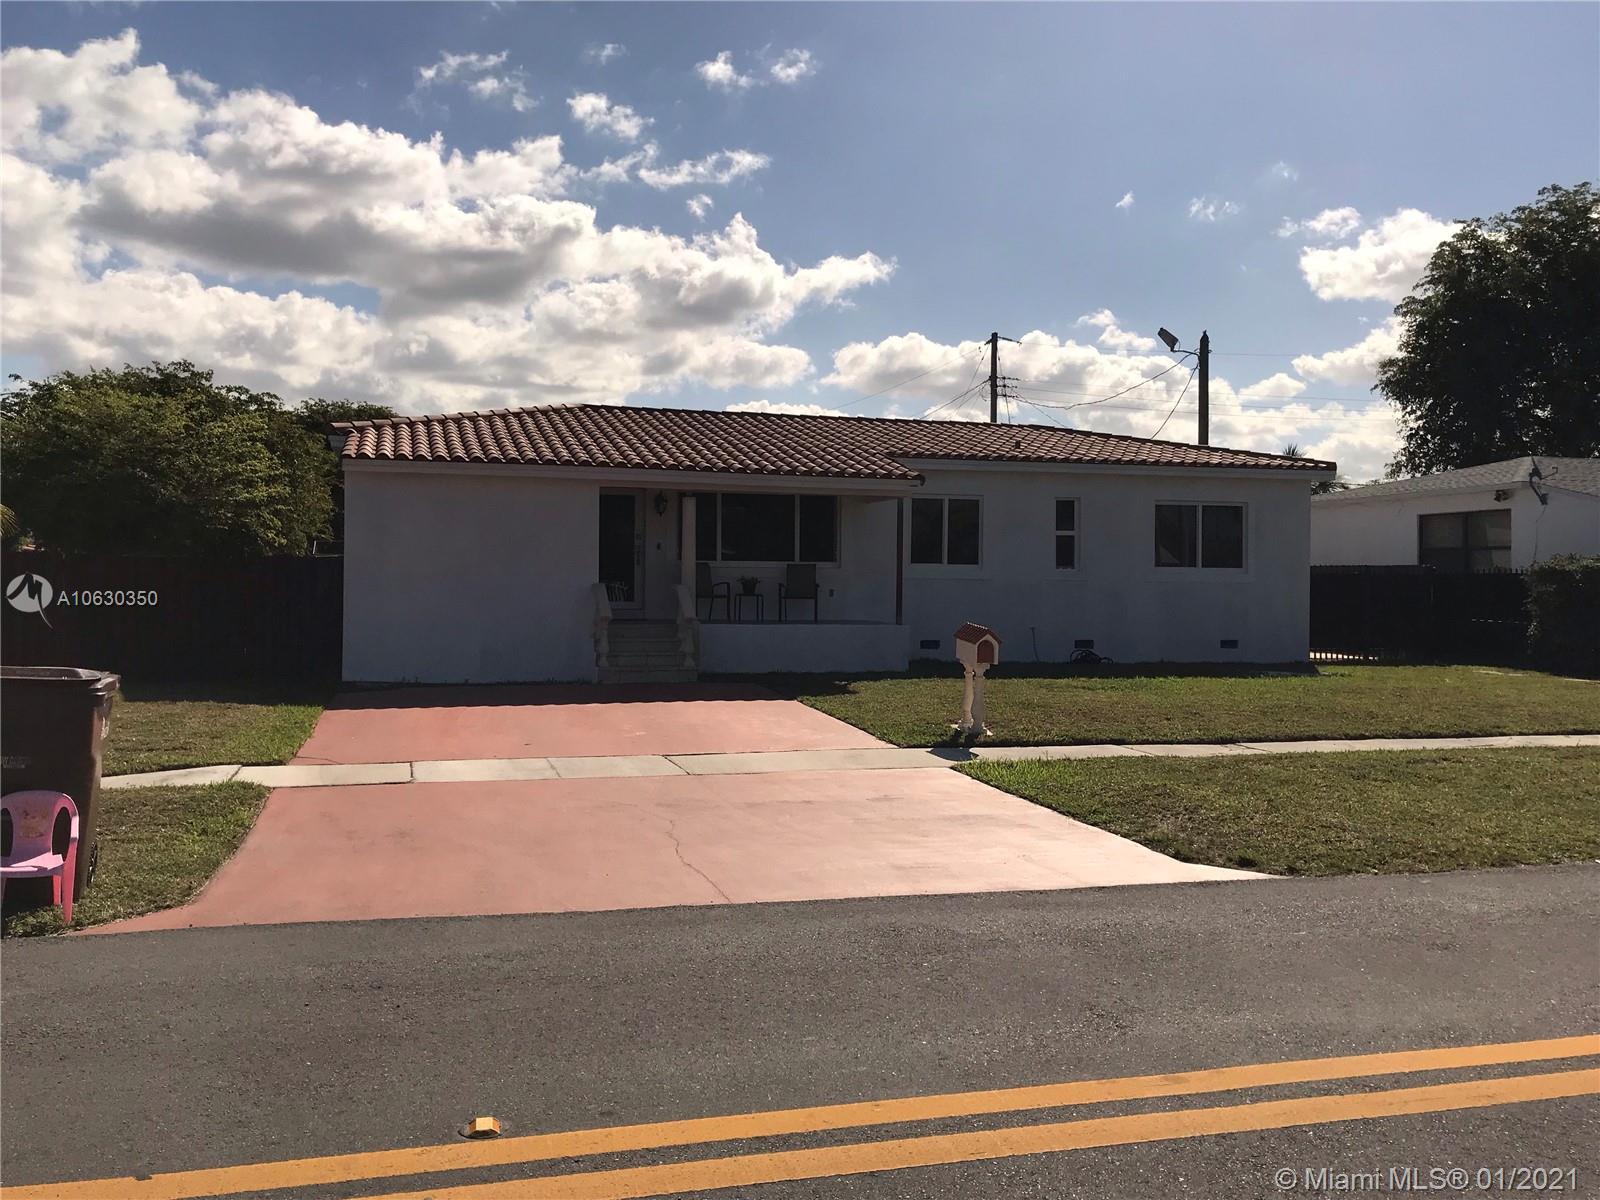 353 W 59th St, Hialeah, FL 33012